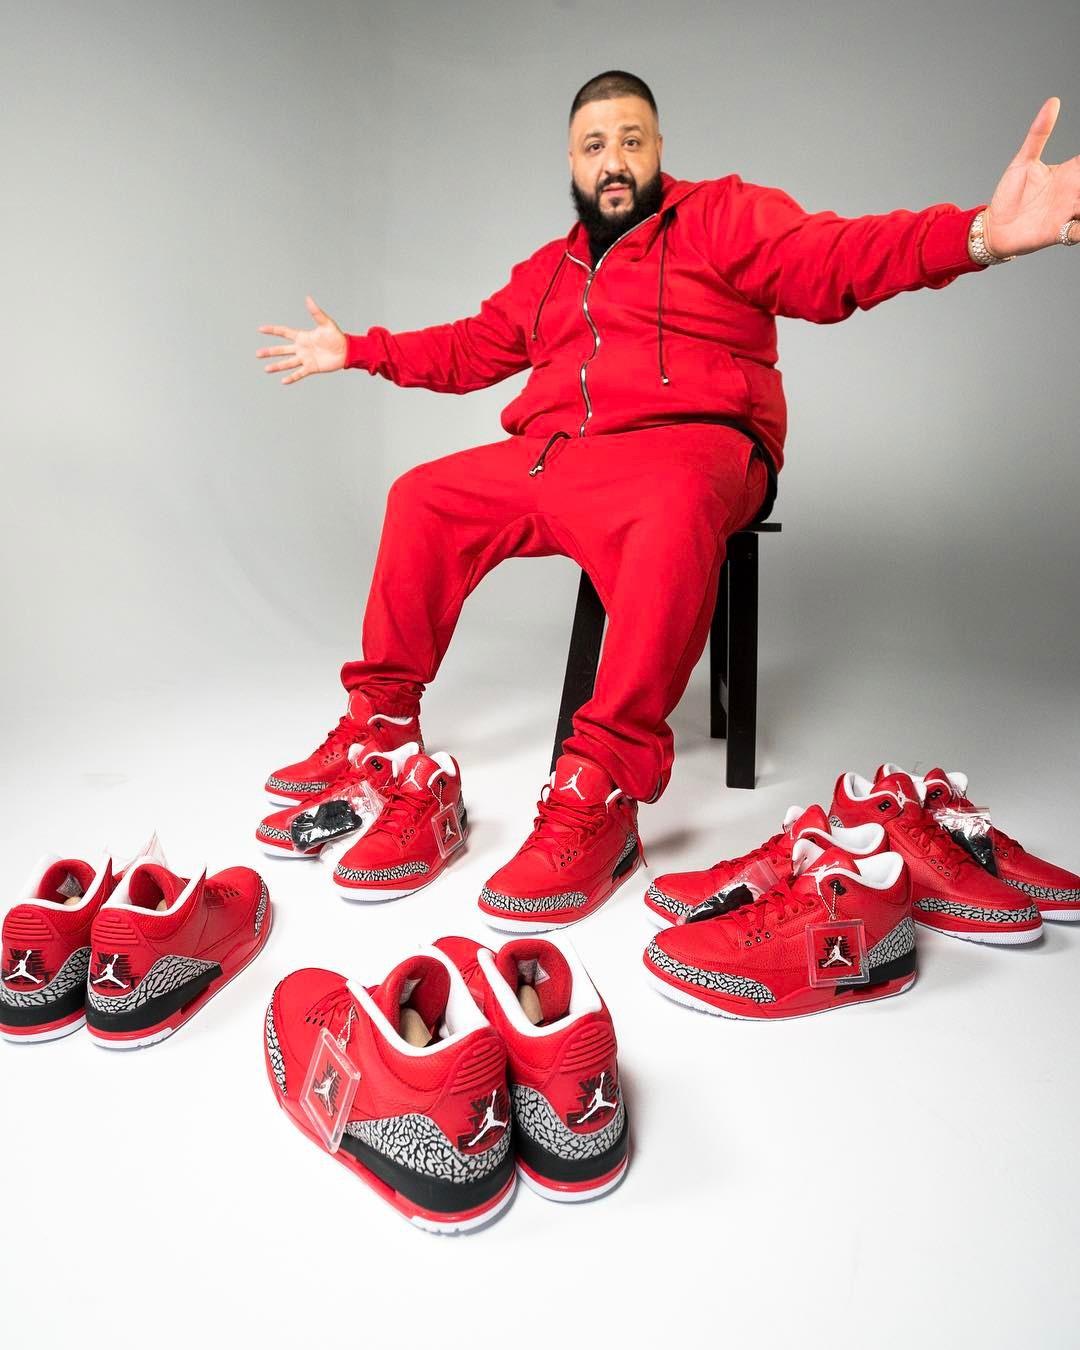 grateful air khaled jordan retro Pas 3 Chaussures cher dj FlKJc1